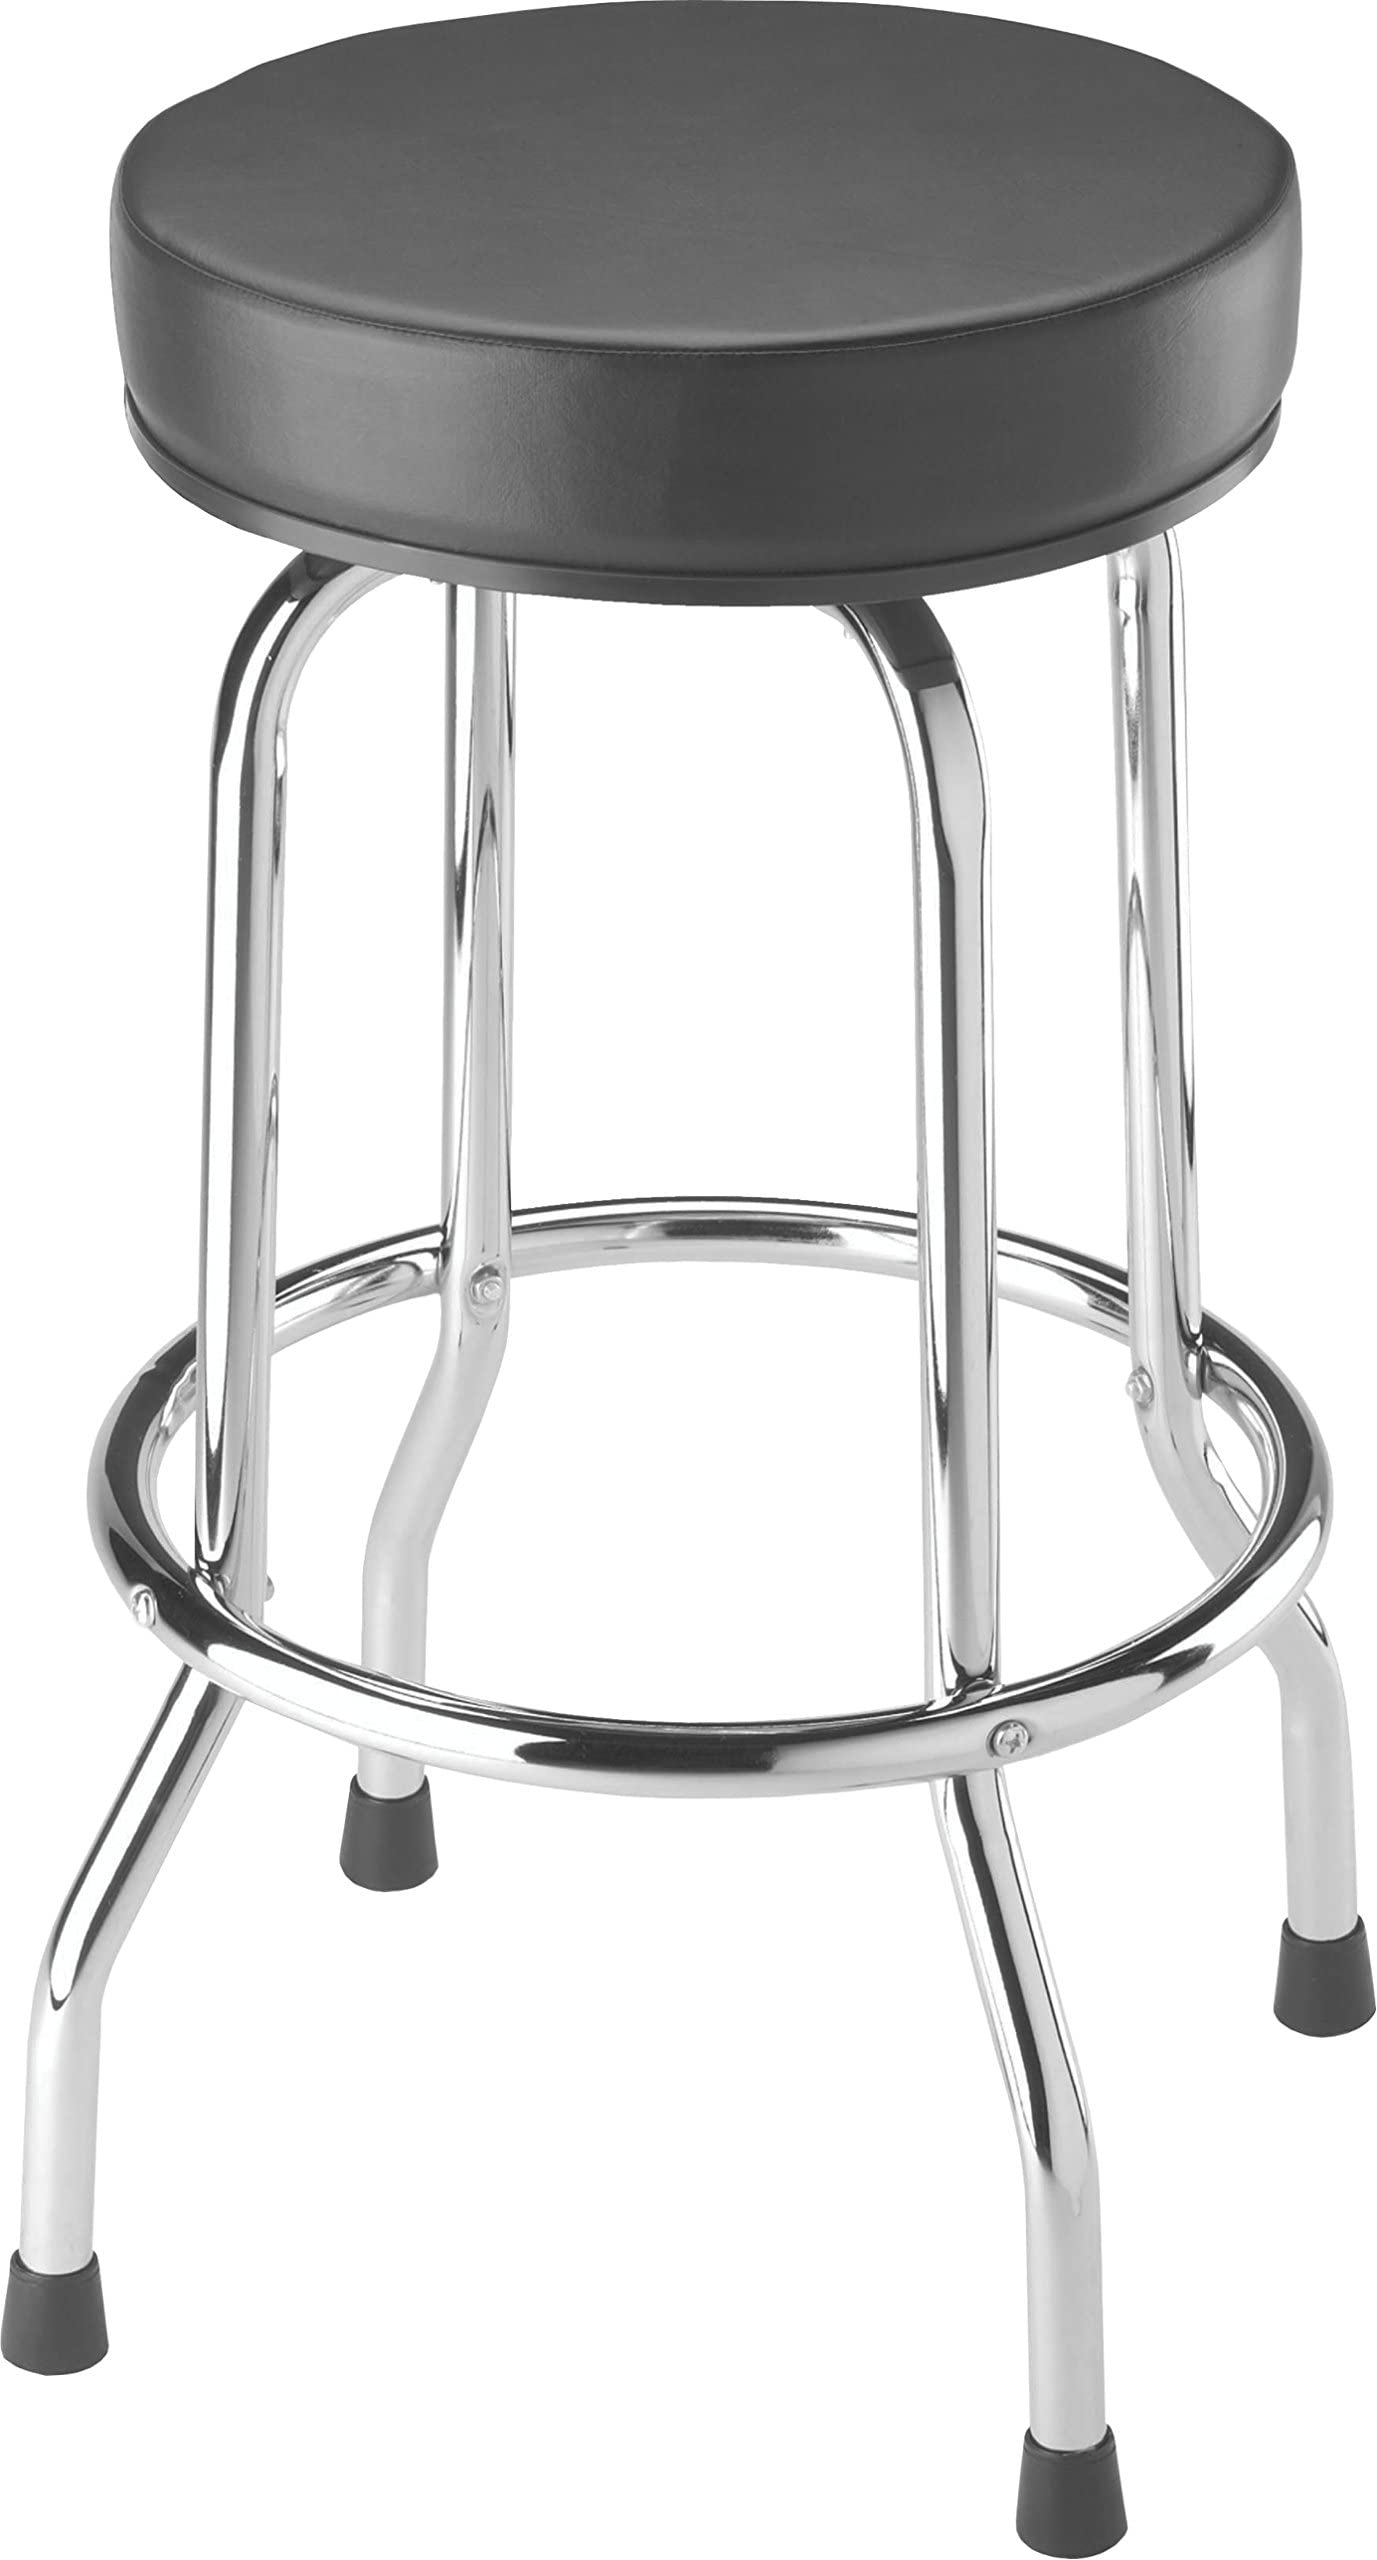 Torin Big Red Swivel Bar Stool / Shop Seat Black  sc 1 st  Amazon.com & Bar Stools | Amazon.com islam-shia.org